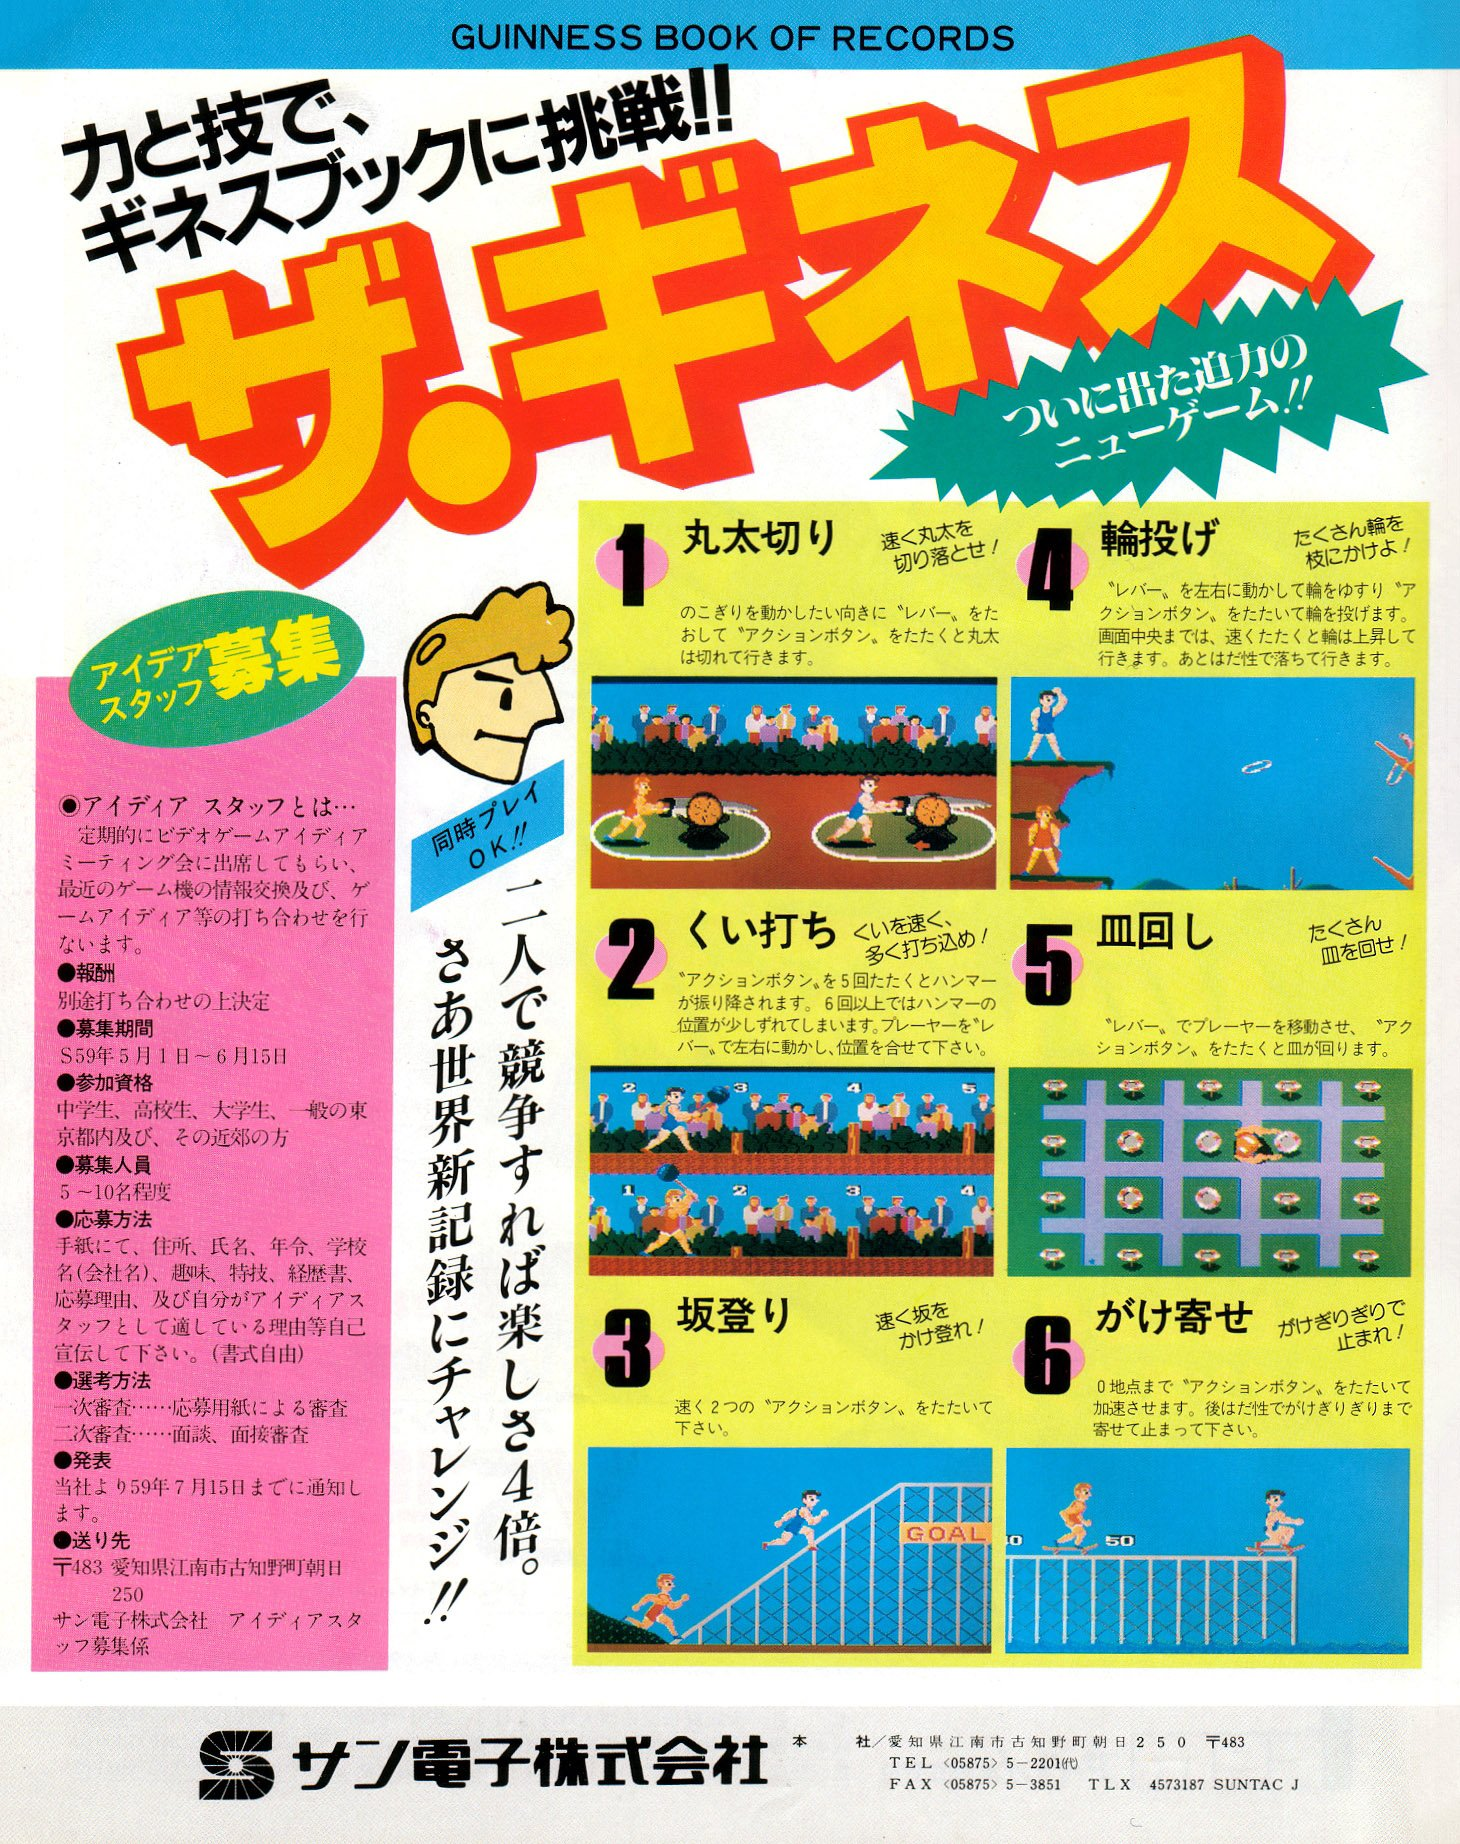 Strength & Skill (The Guinness) (Japan)